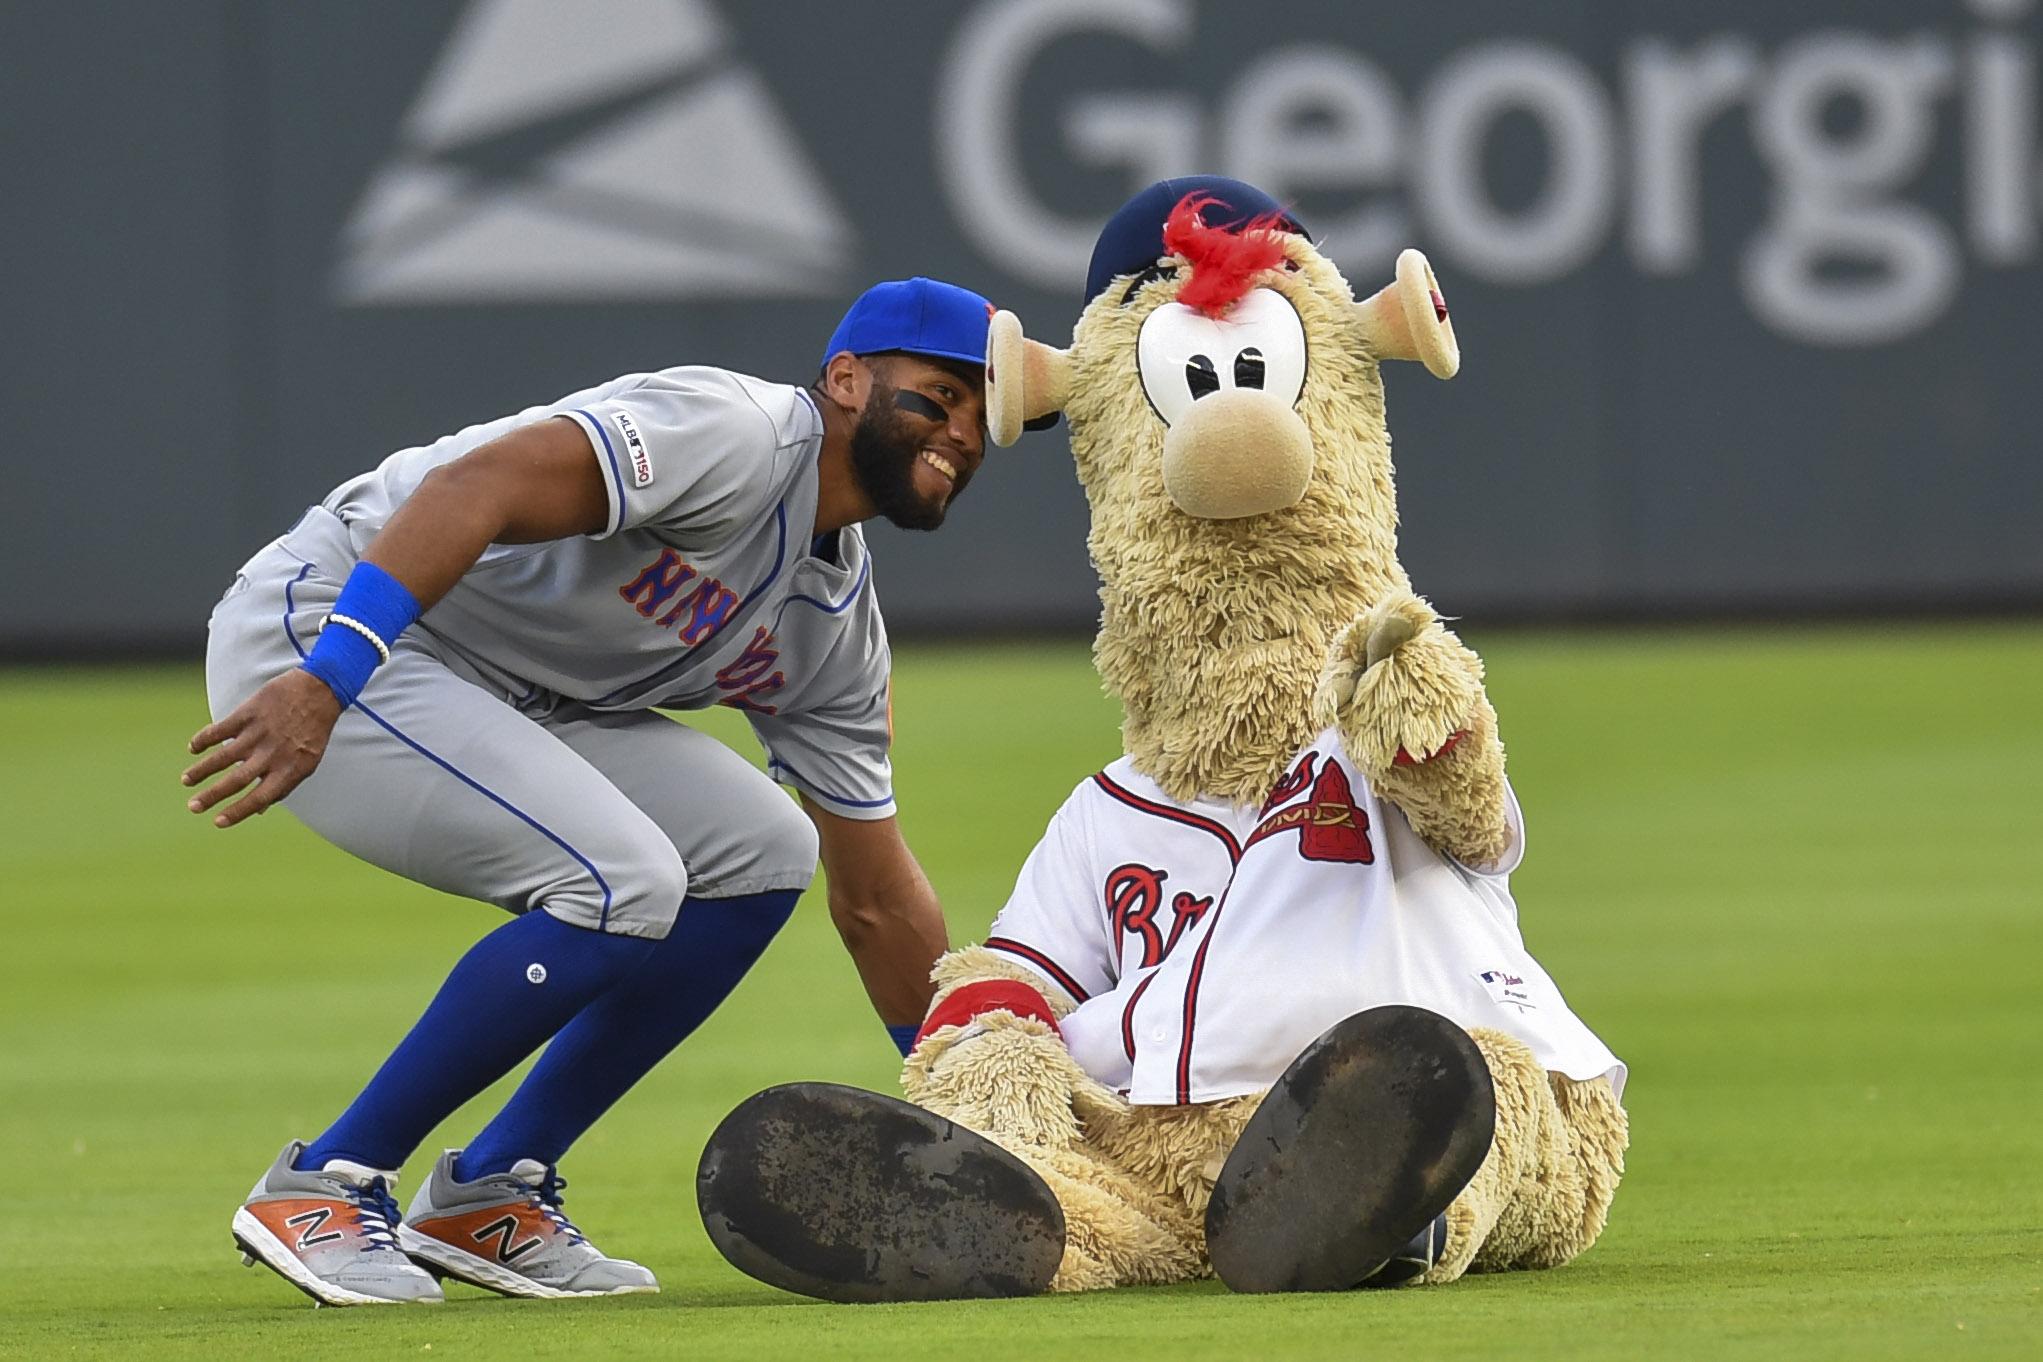 4/12/19 Game Preview: New York Mets at Atlanta Braves